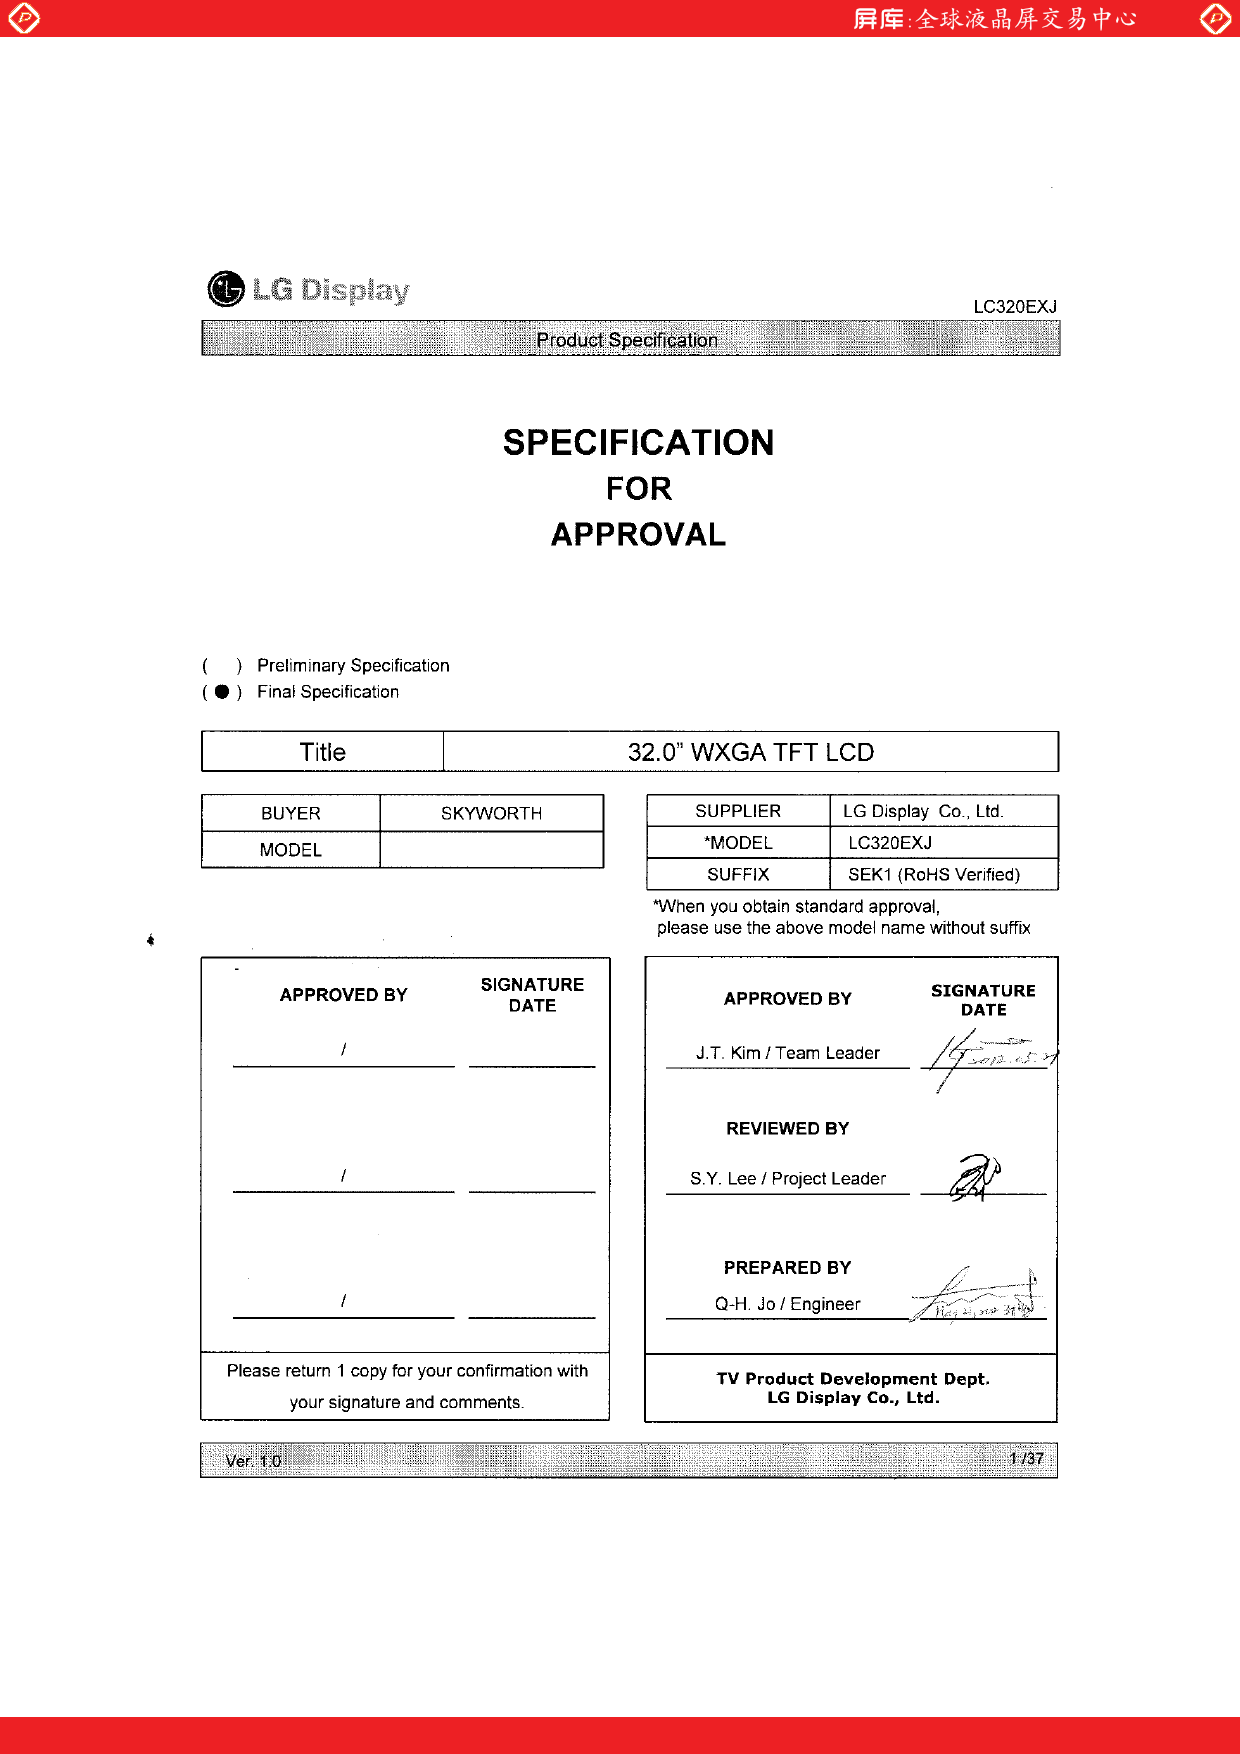 LC320EXJ-SEK1 datasheet